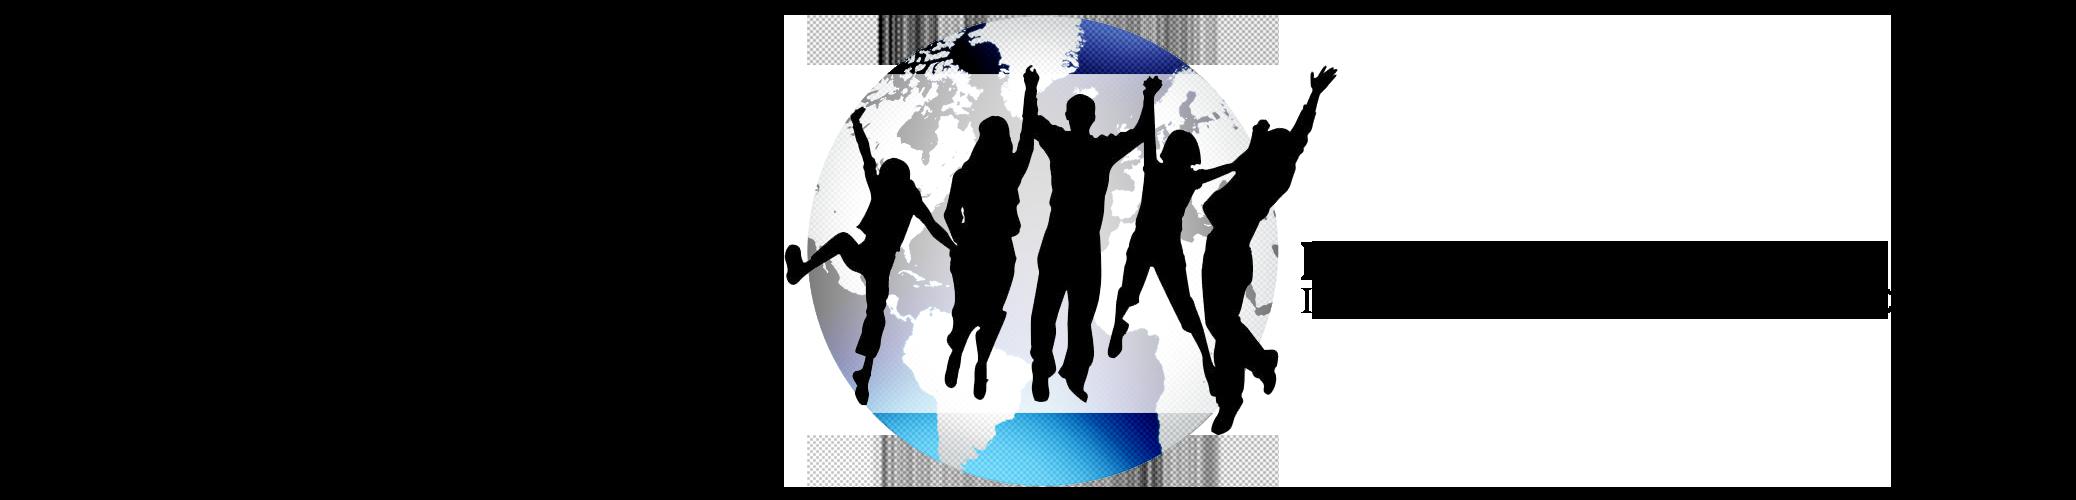 Family Builders International Ministries, Inc.